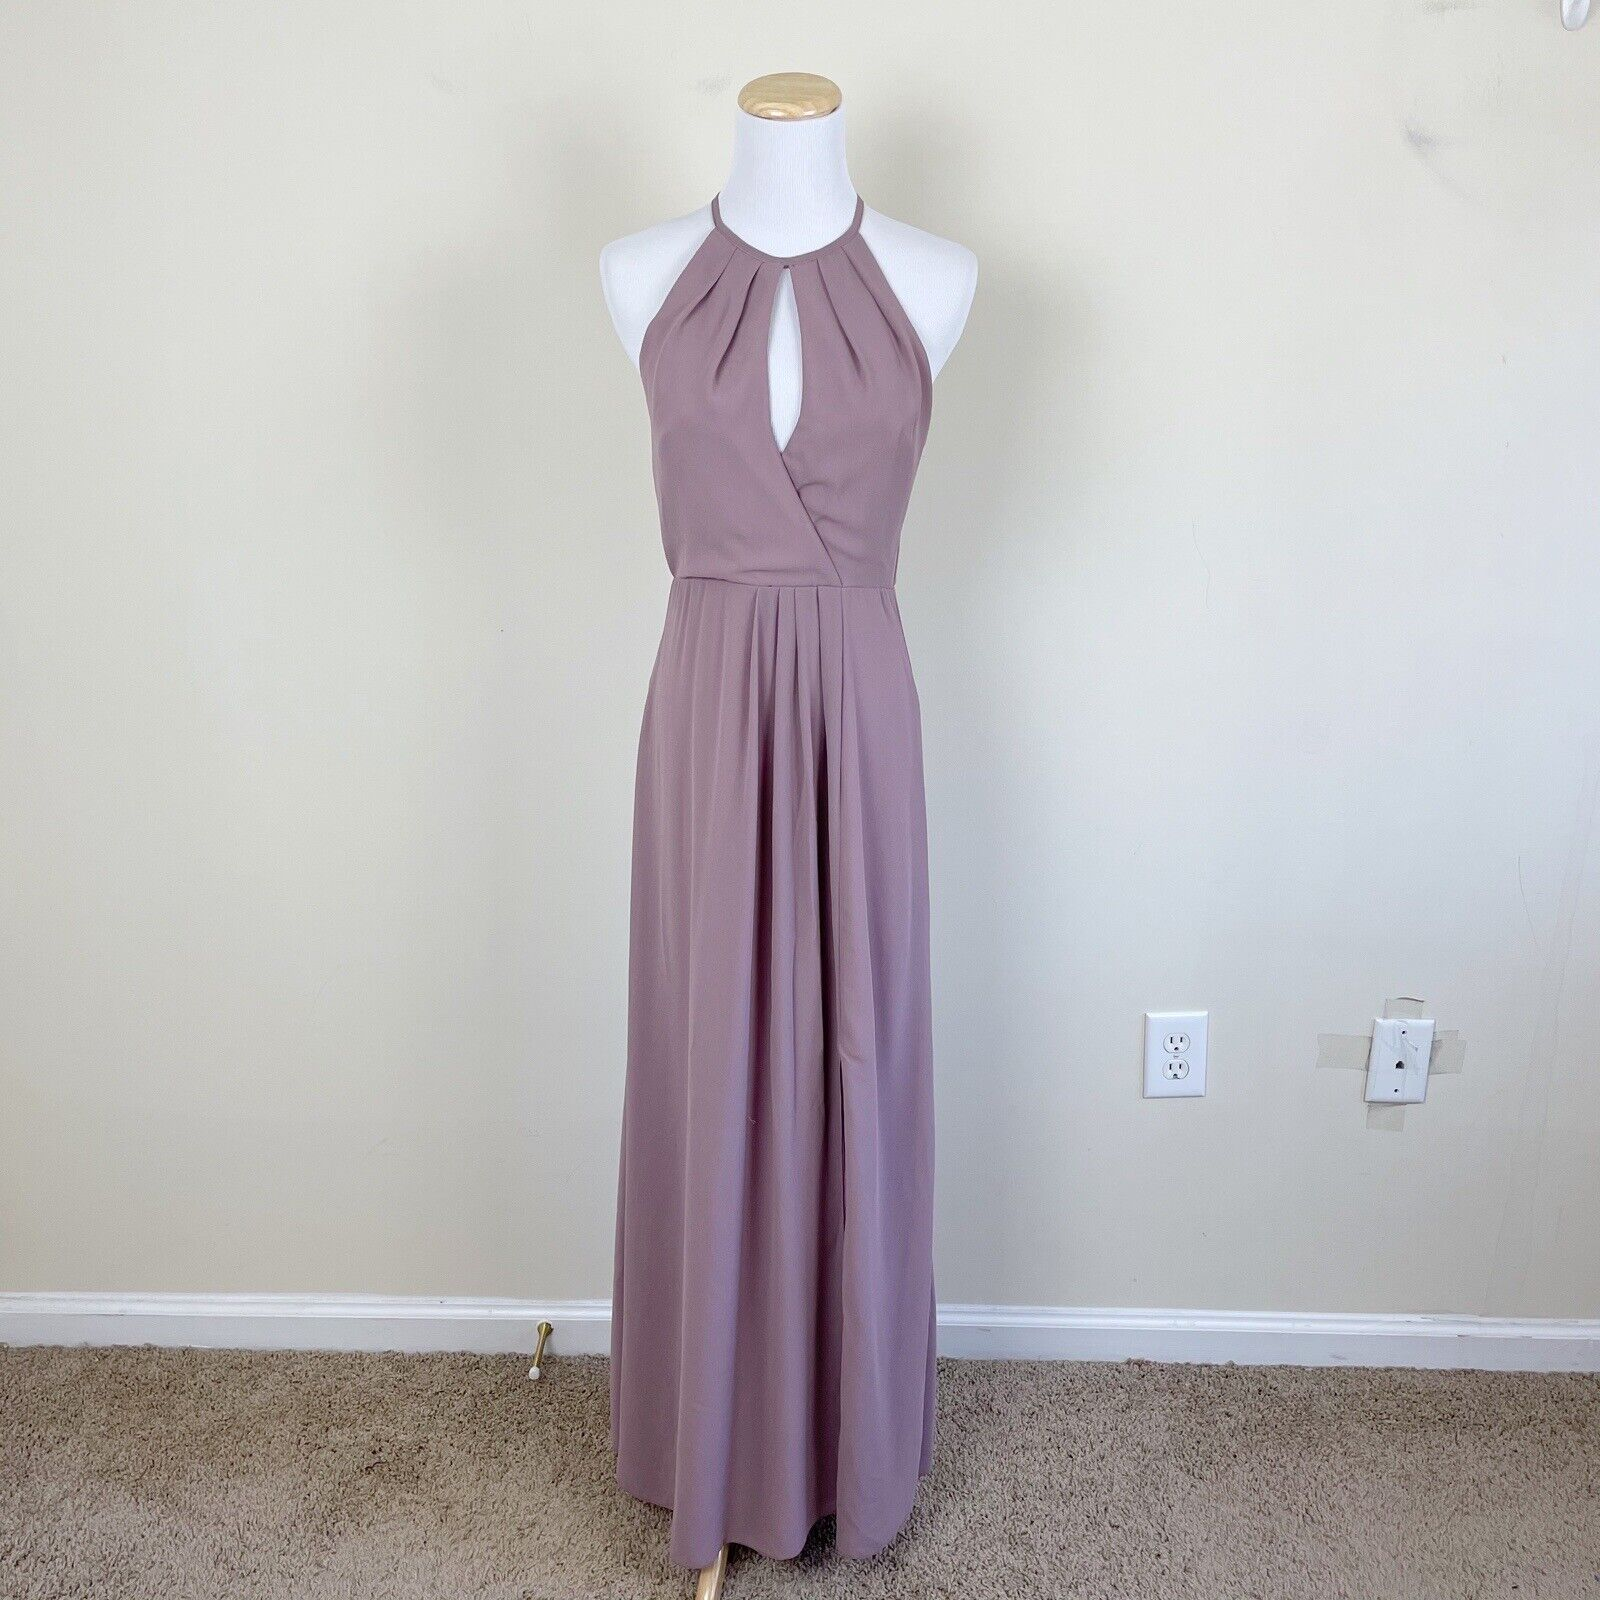 BHLDN x Anthropologie Marco Rose High Neck Formal Long Sleeveless Dress Size XS